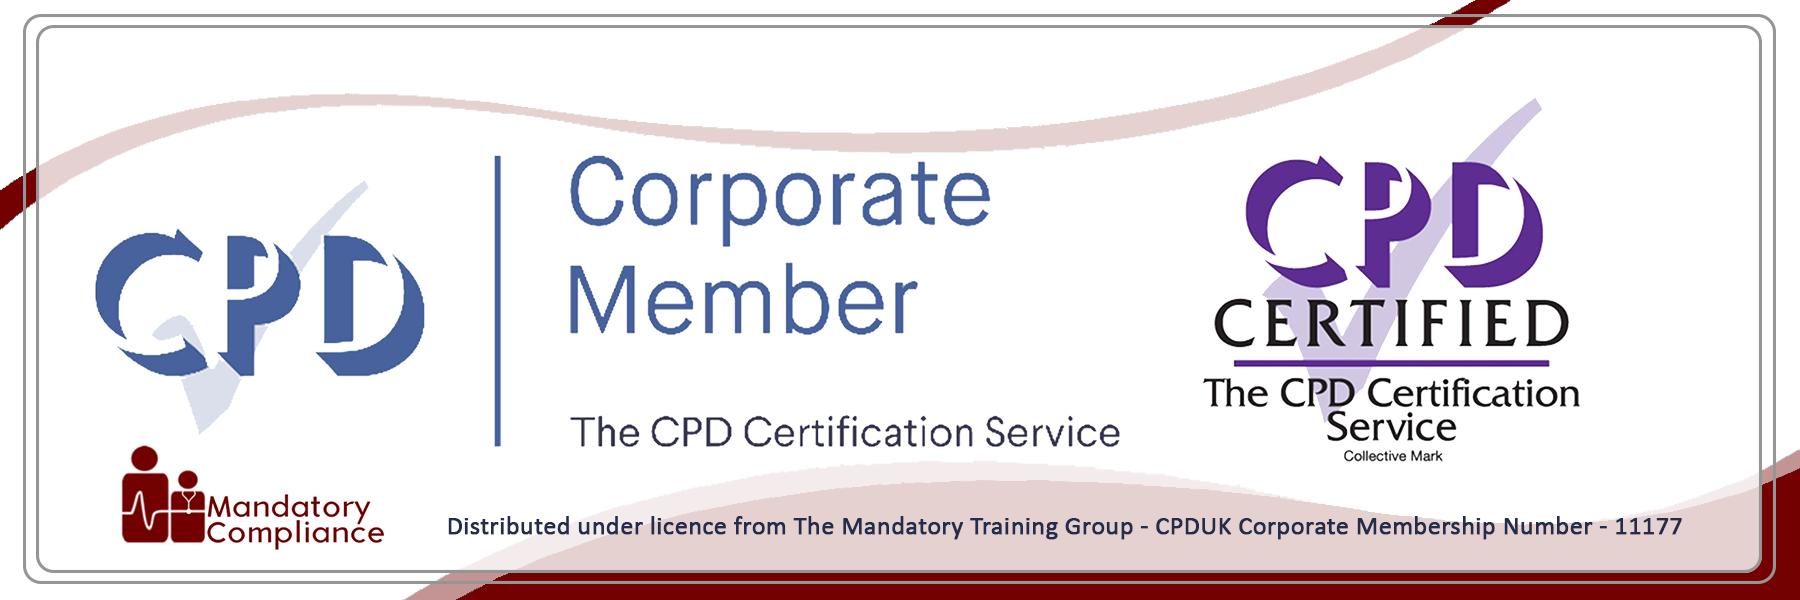 CV Writing Skills - Online Training Course - CPDUK Accredited - Mandatory Compliance UK -